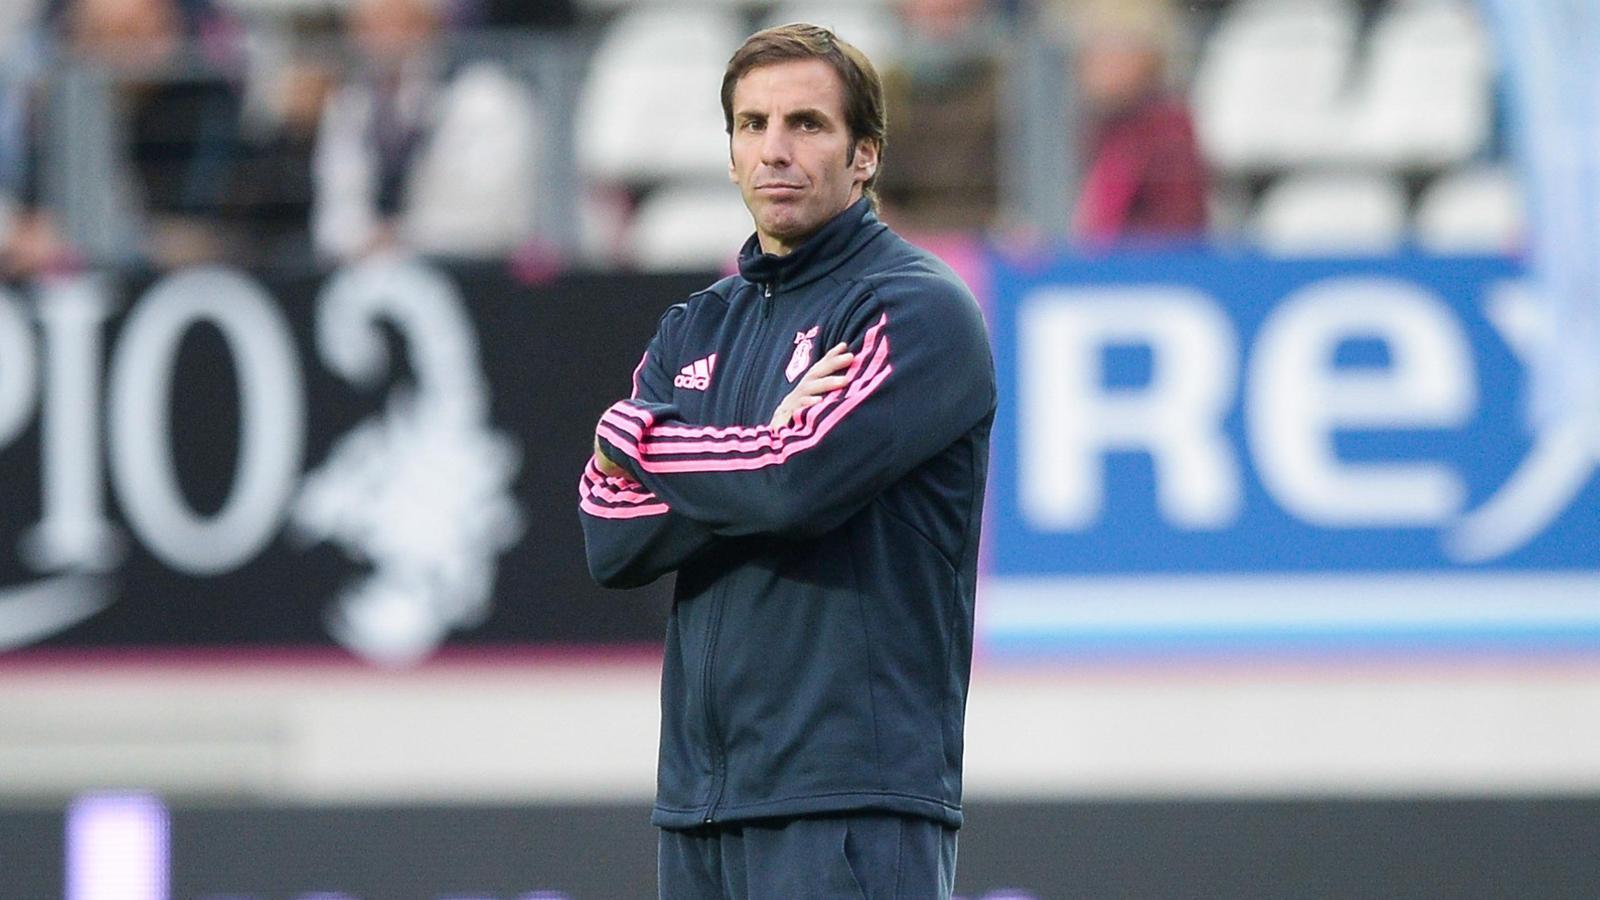 Gonzalo Quesada, le manager du Stade français